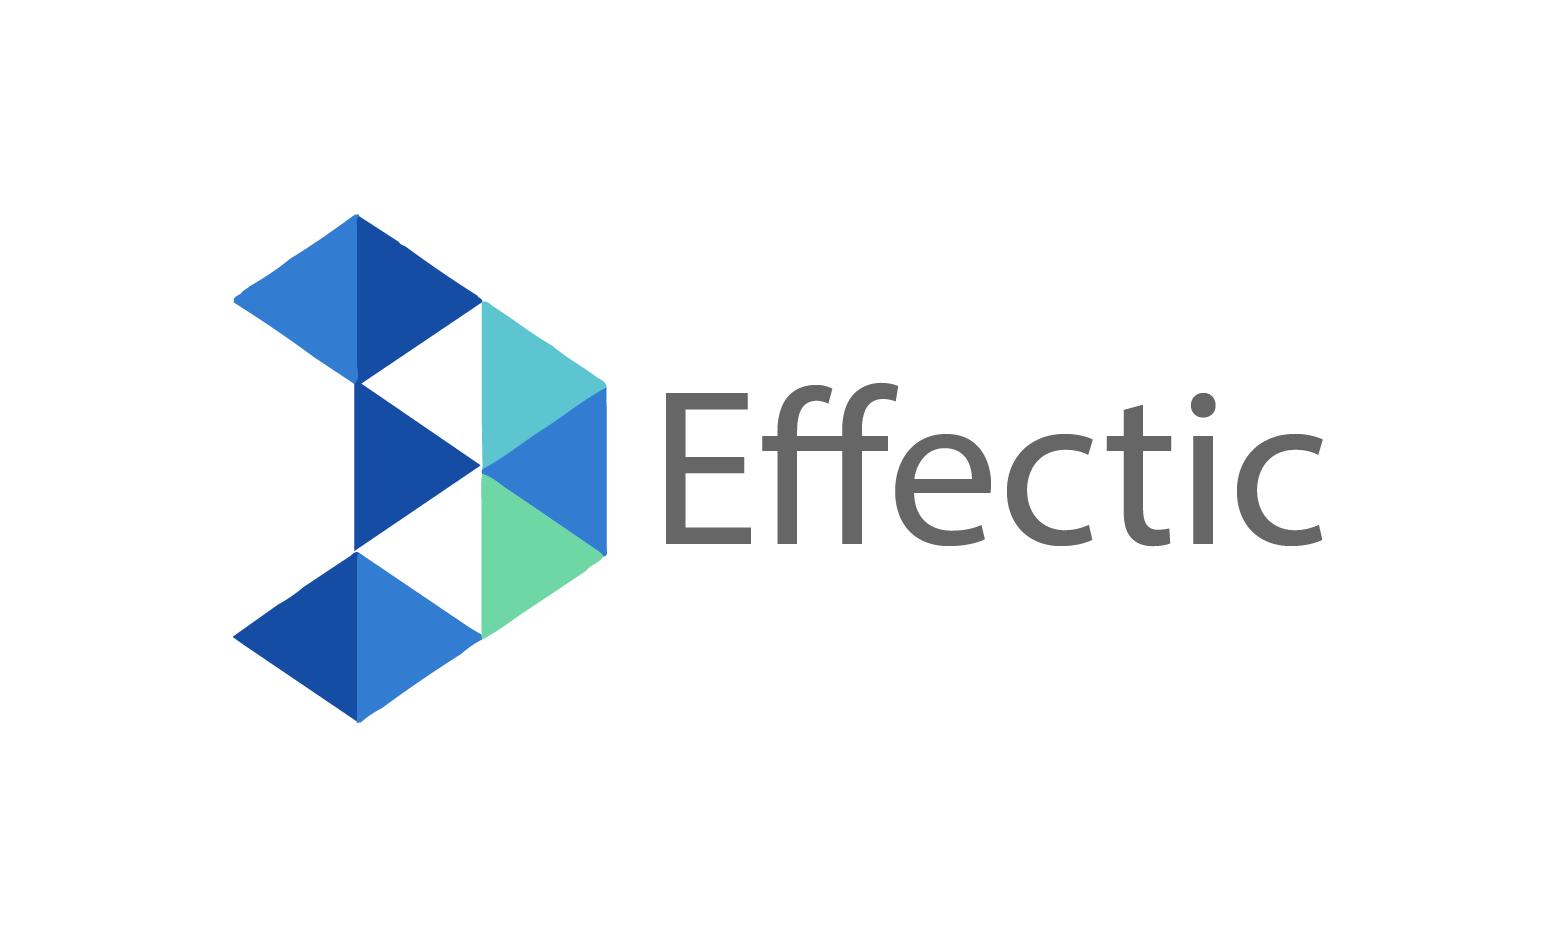 effectic.com